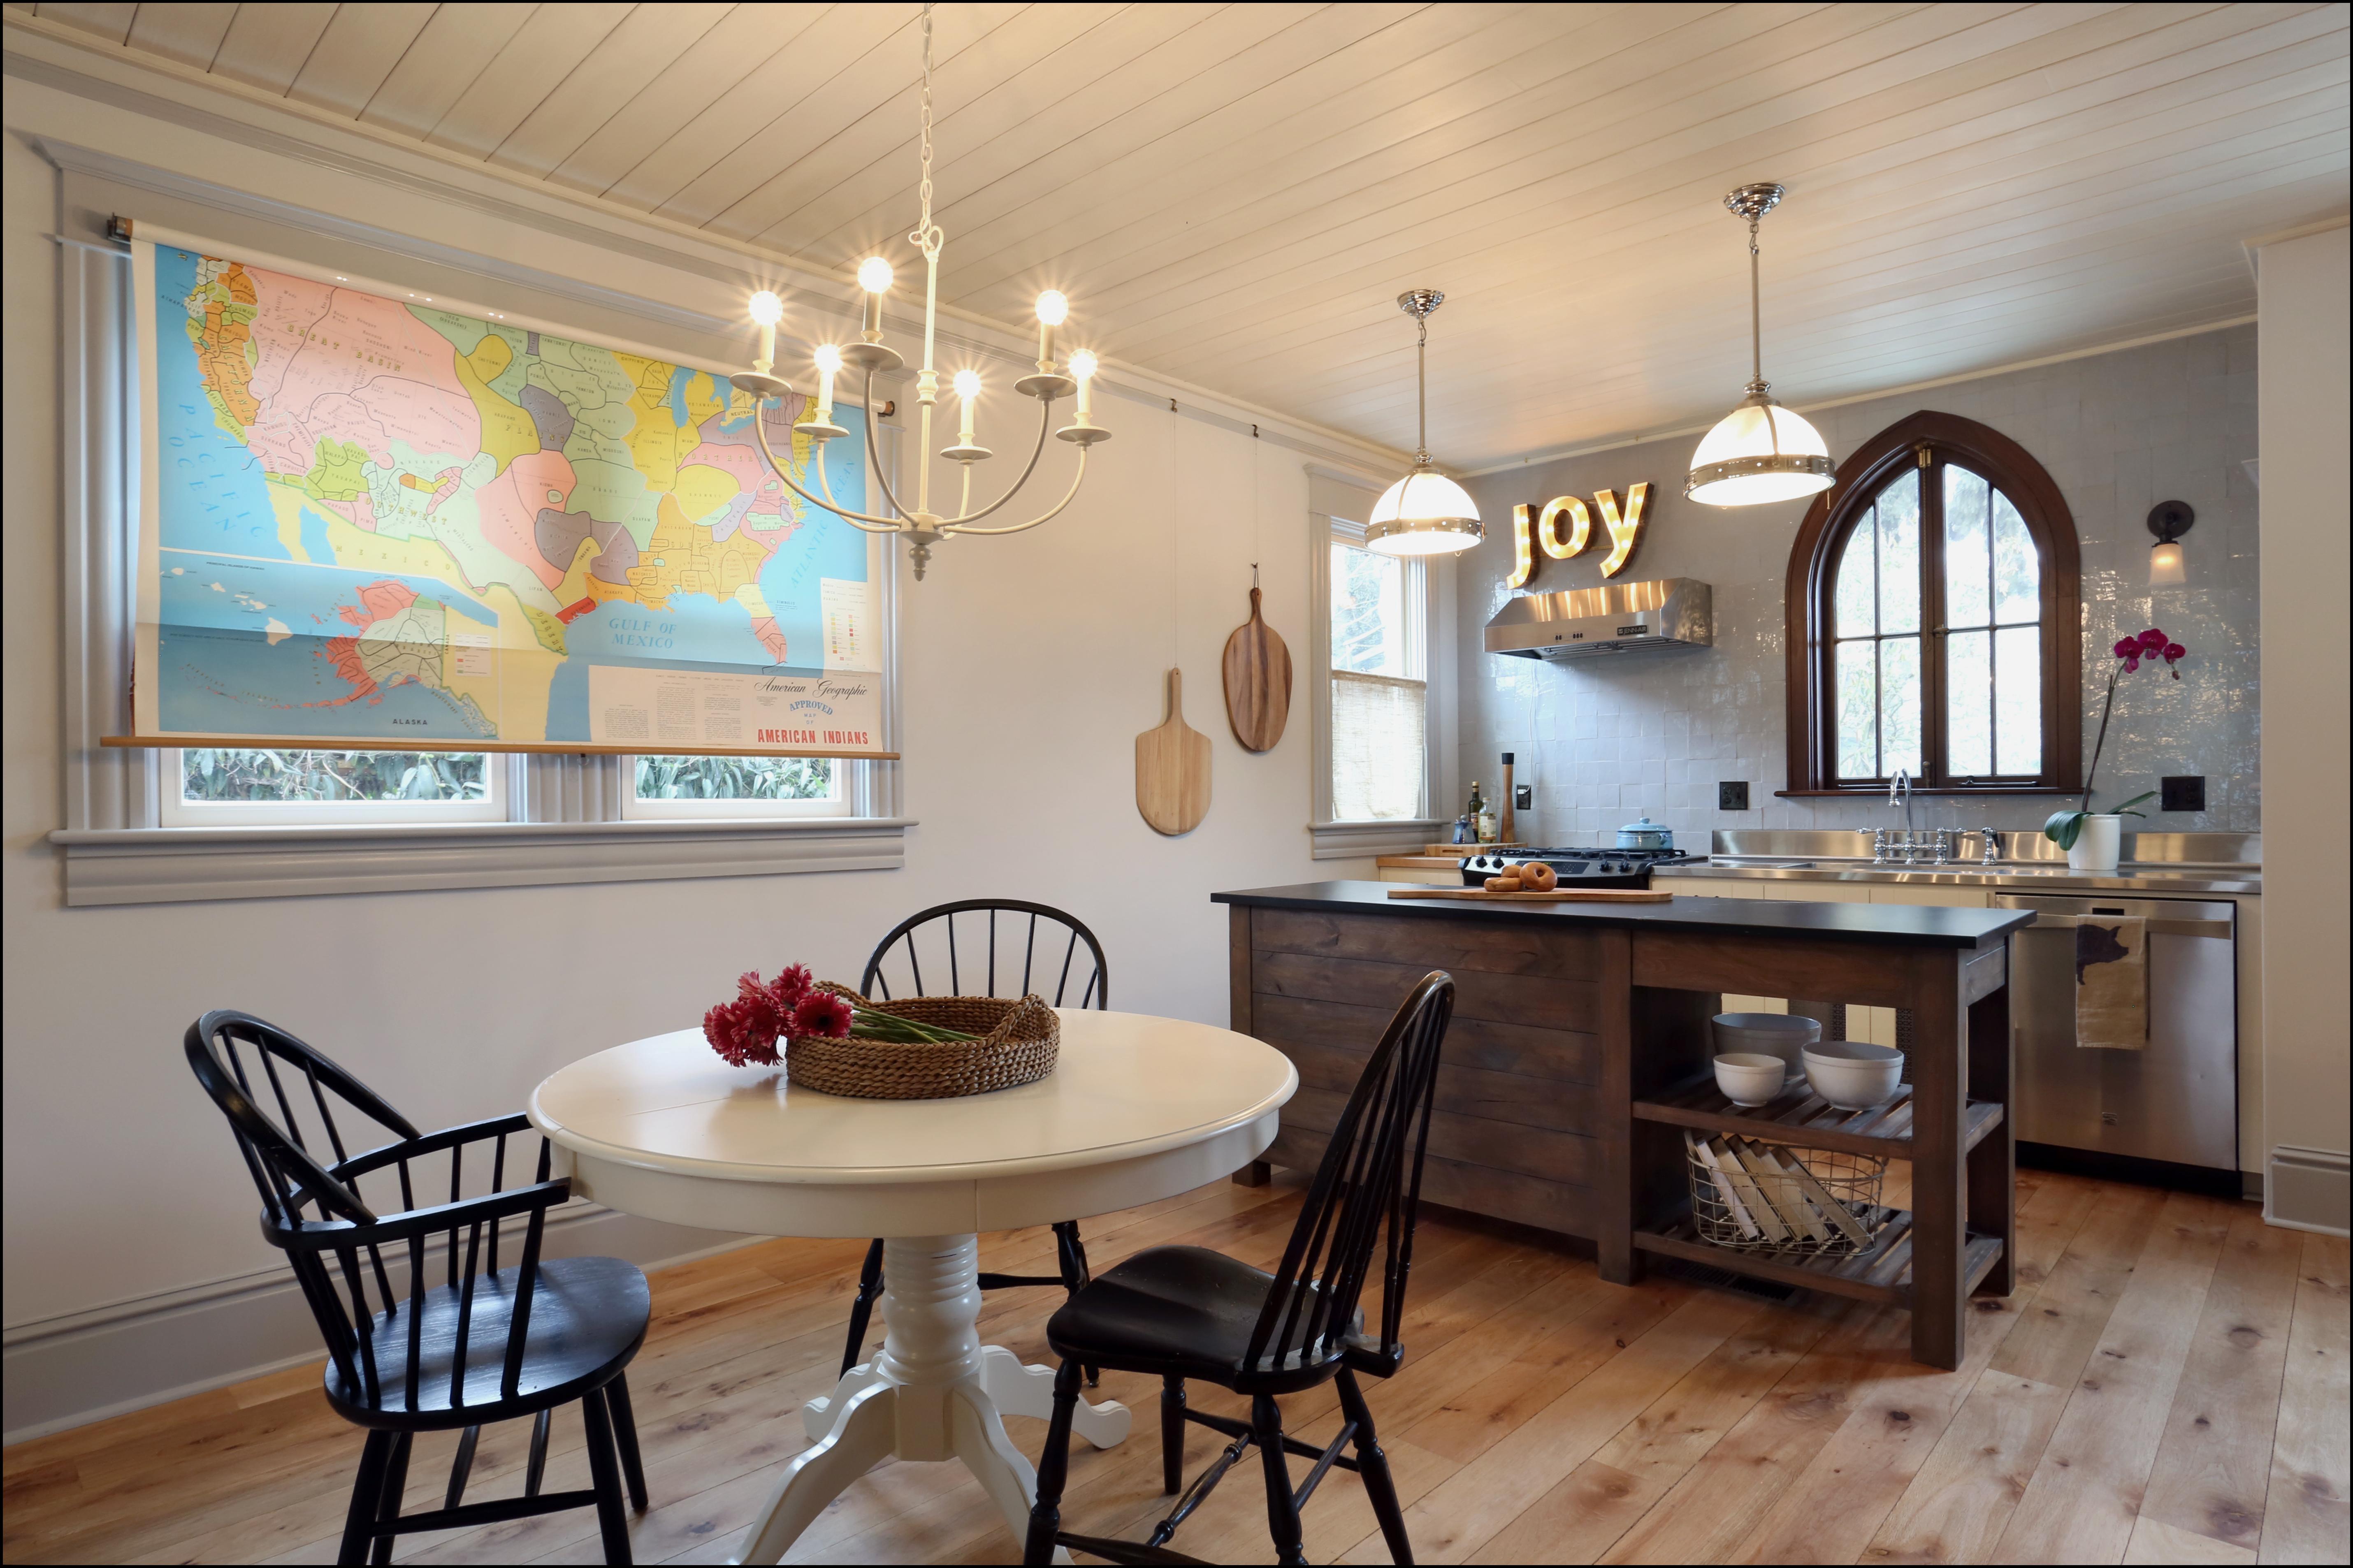 Uncategorized/luxury designer bedding/abernathy - Hardison_1902_kitchen_a_8_p Design